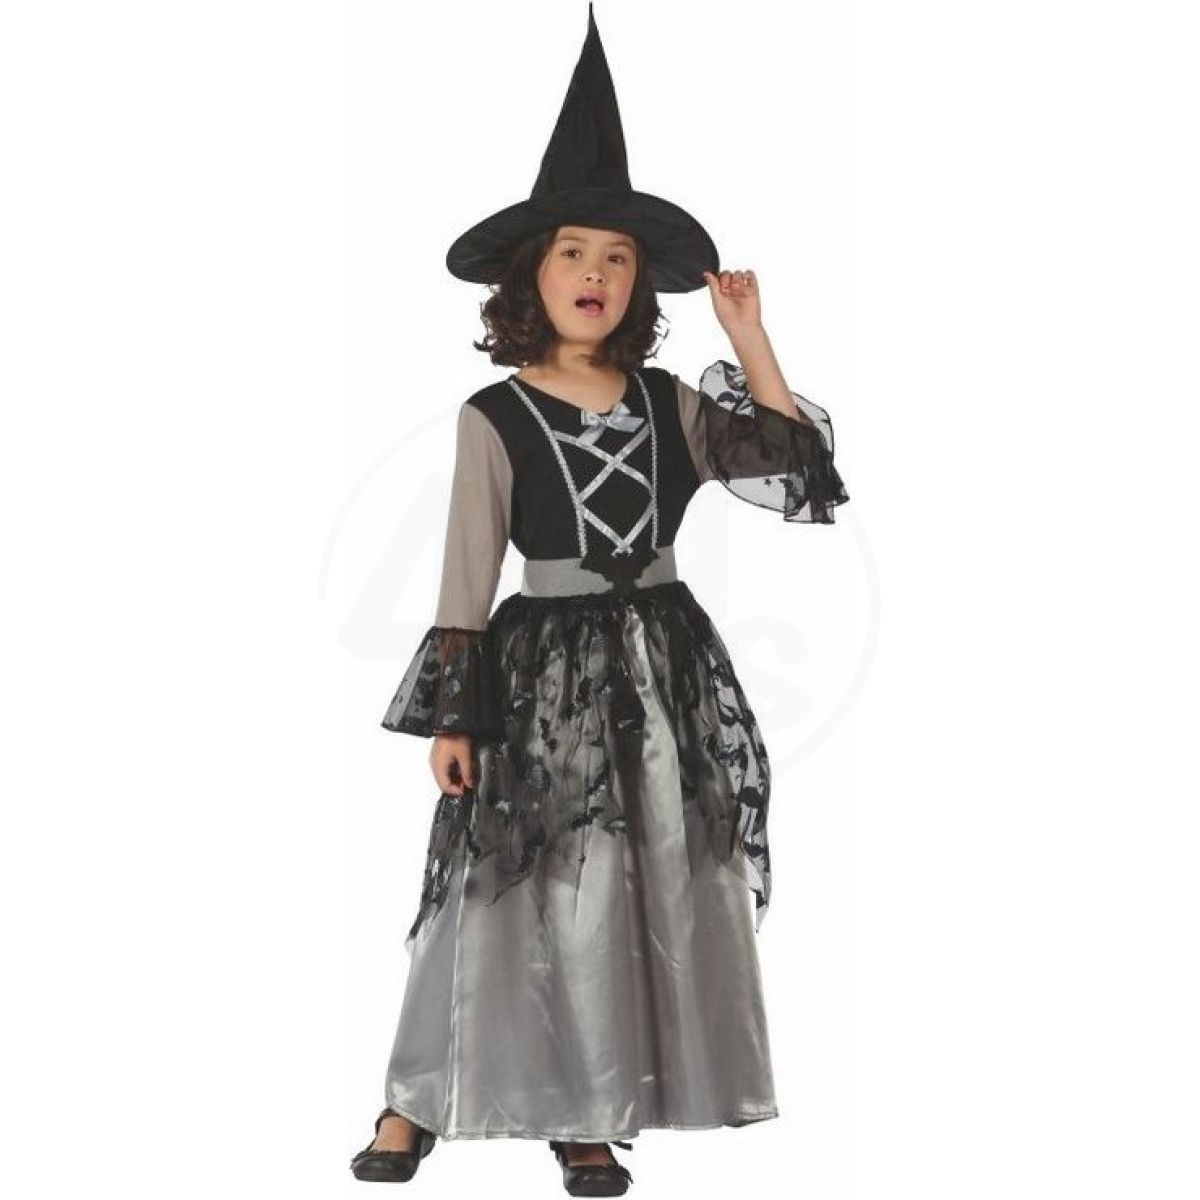 d136309150b5 Made Dětský kostým Čarodějka 110-120 cm